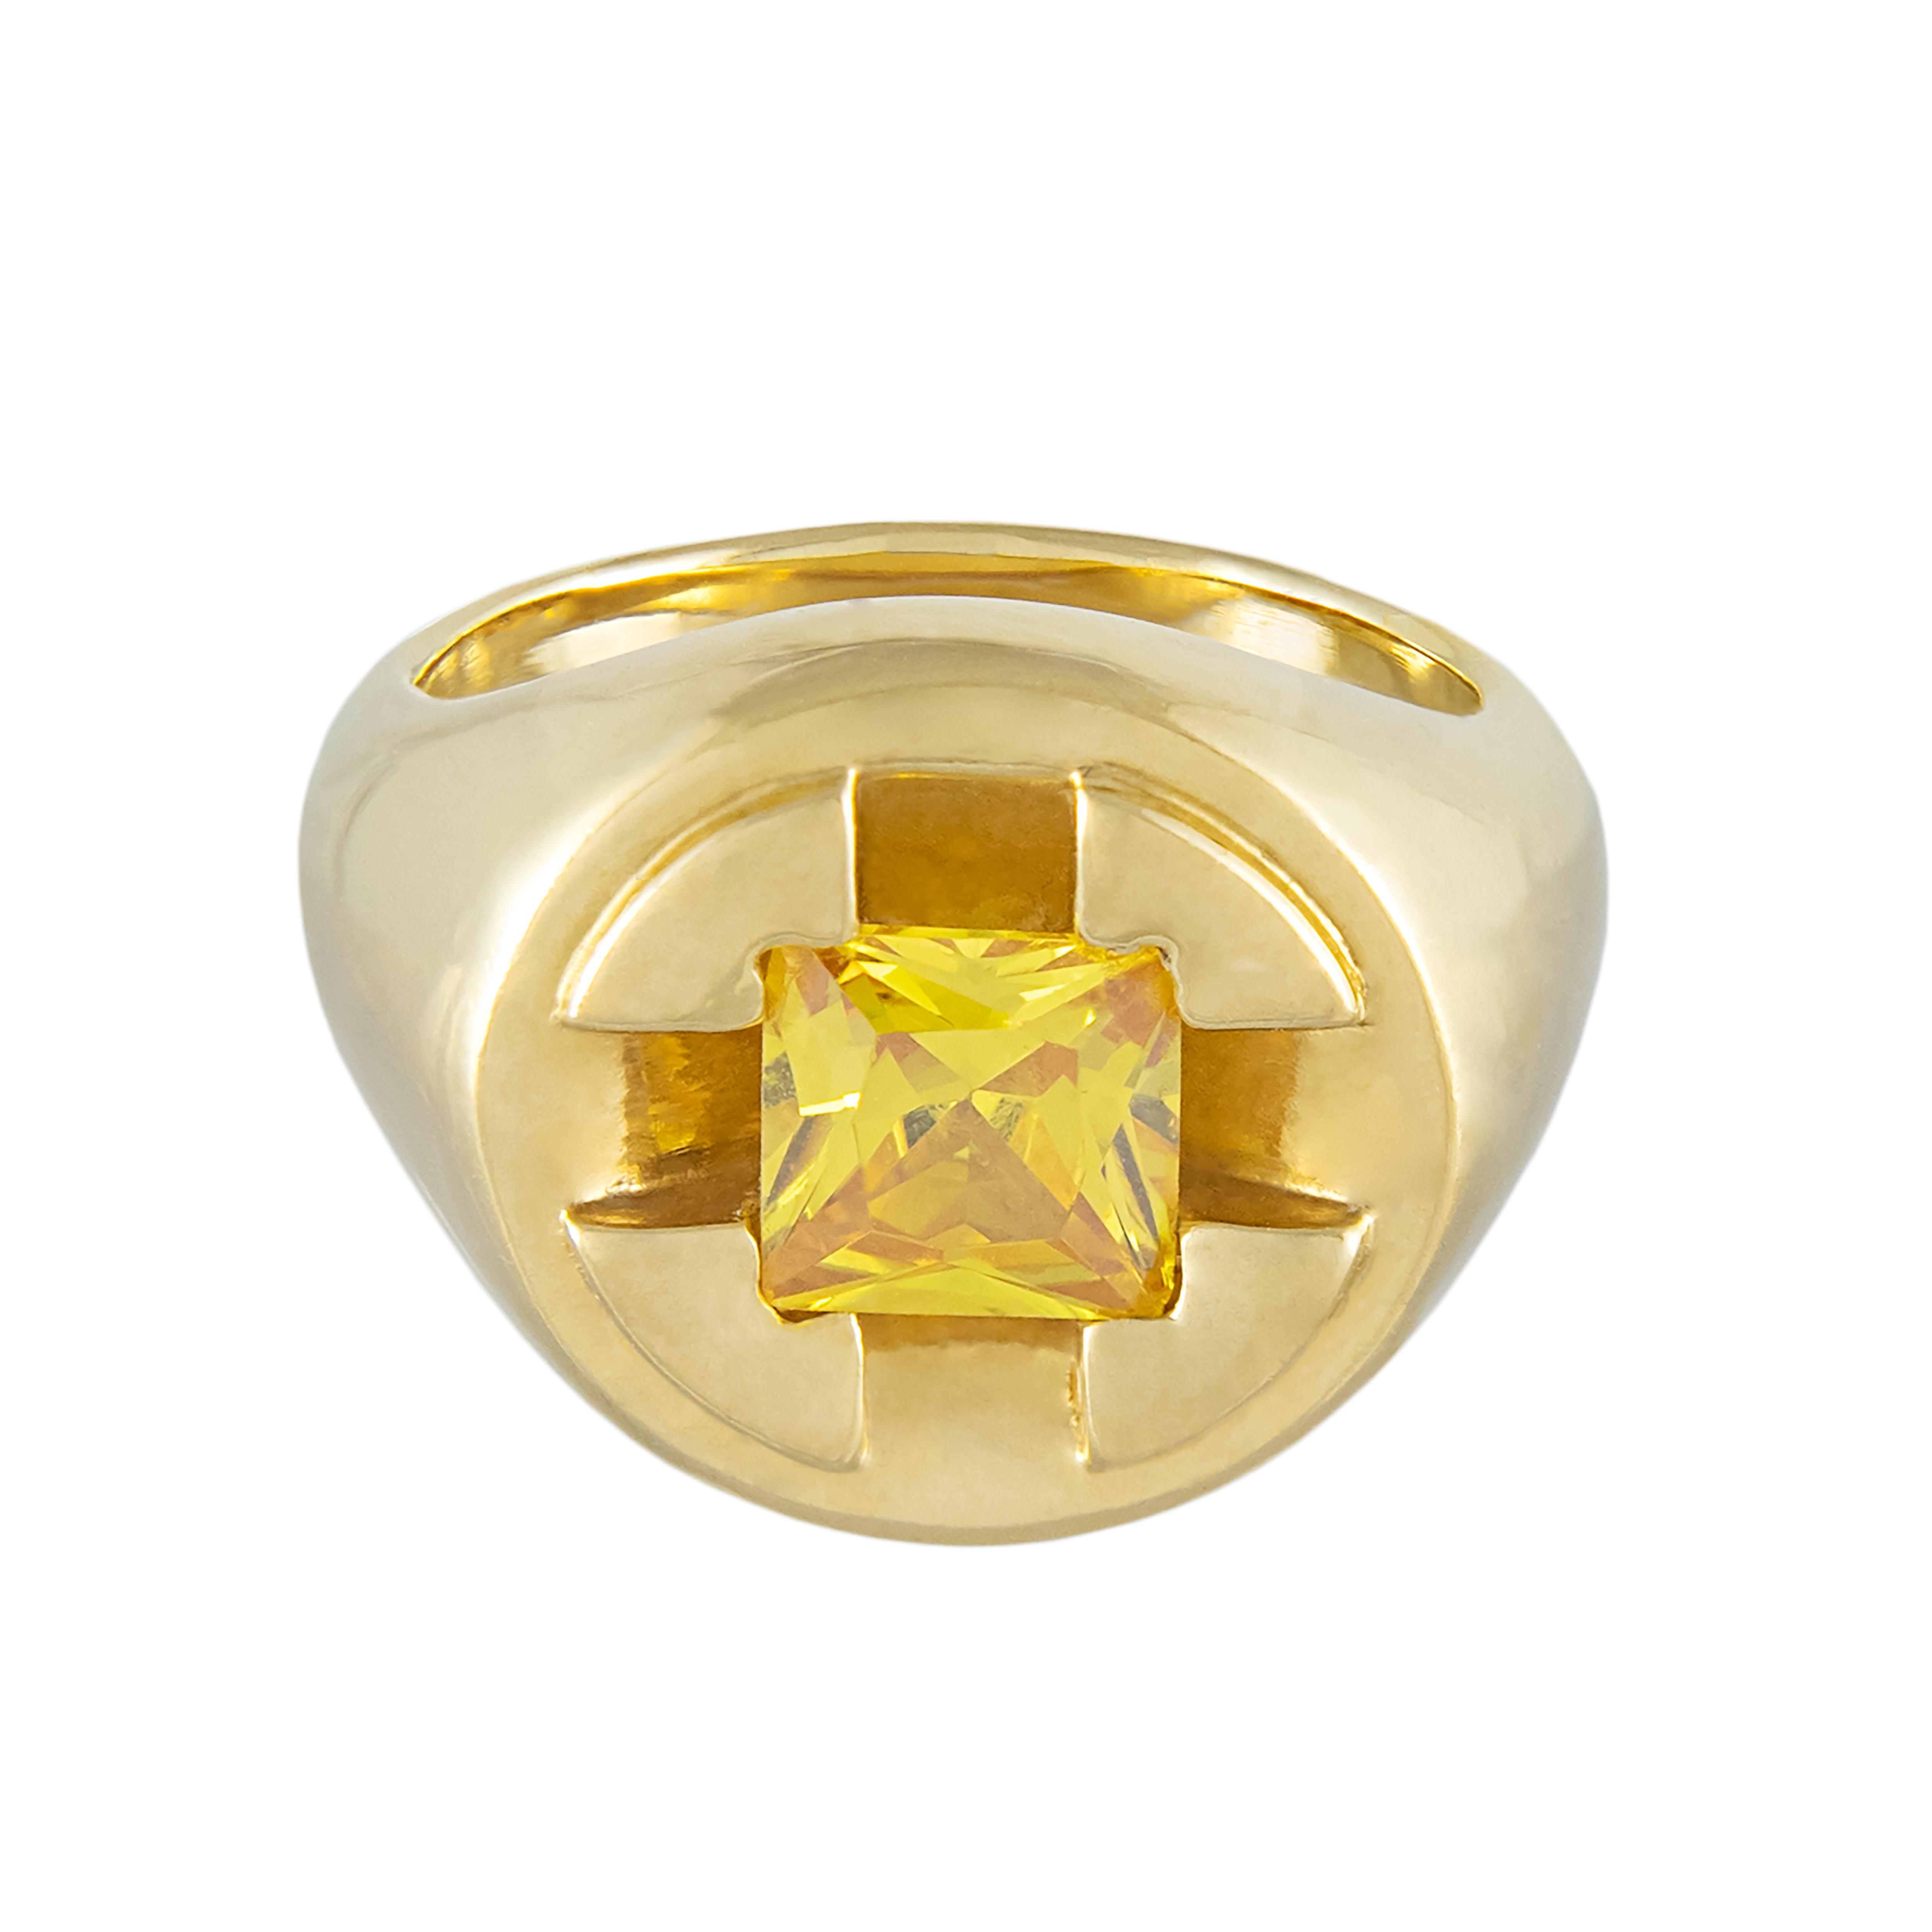 Screw It Signet Ring, yellow citrine